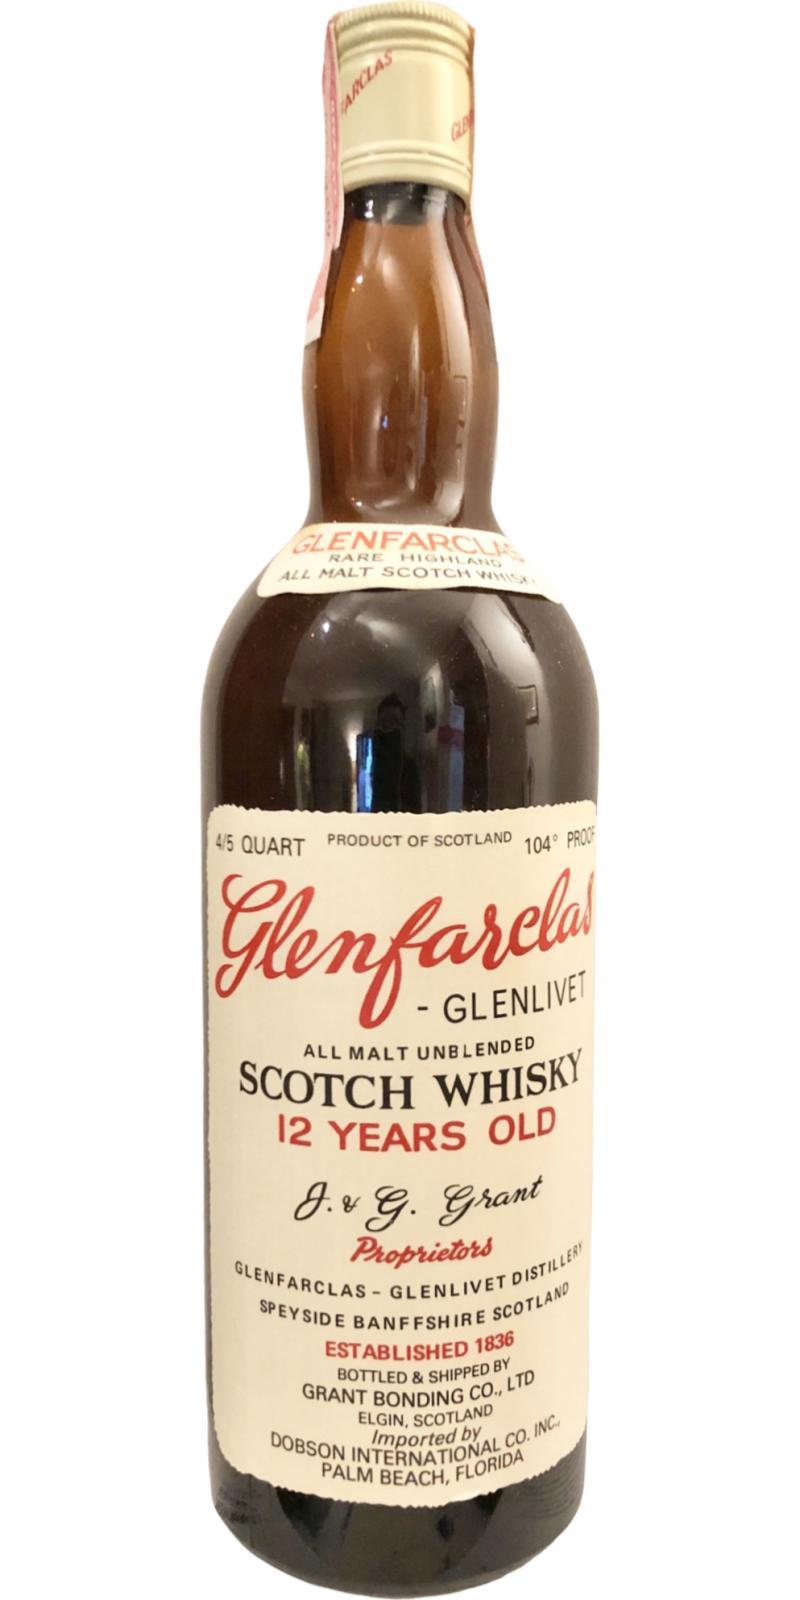 Glenfarclas All Malt Unblended